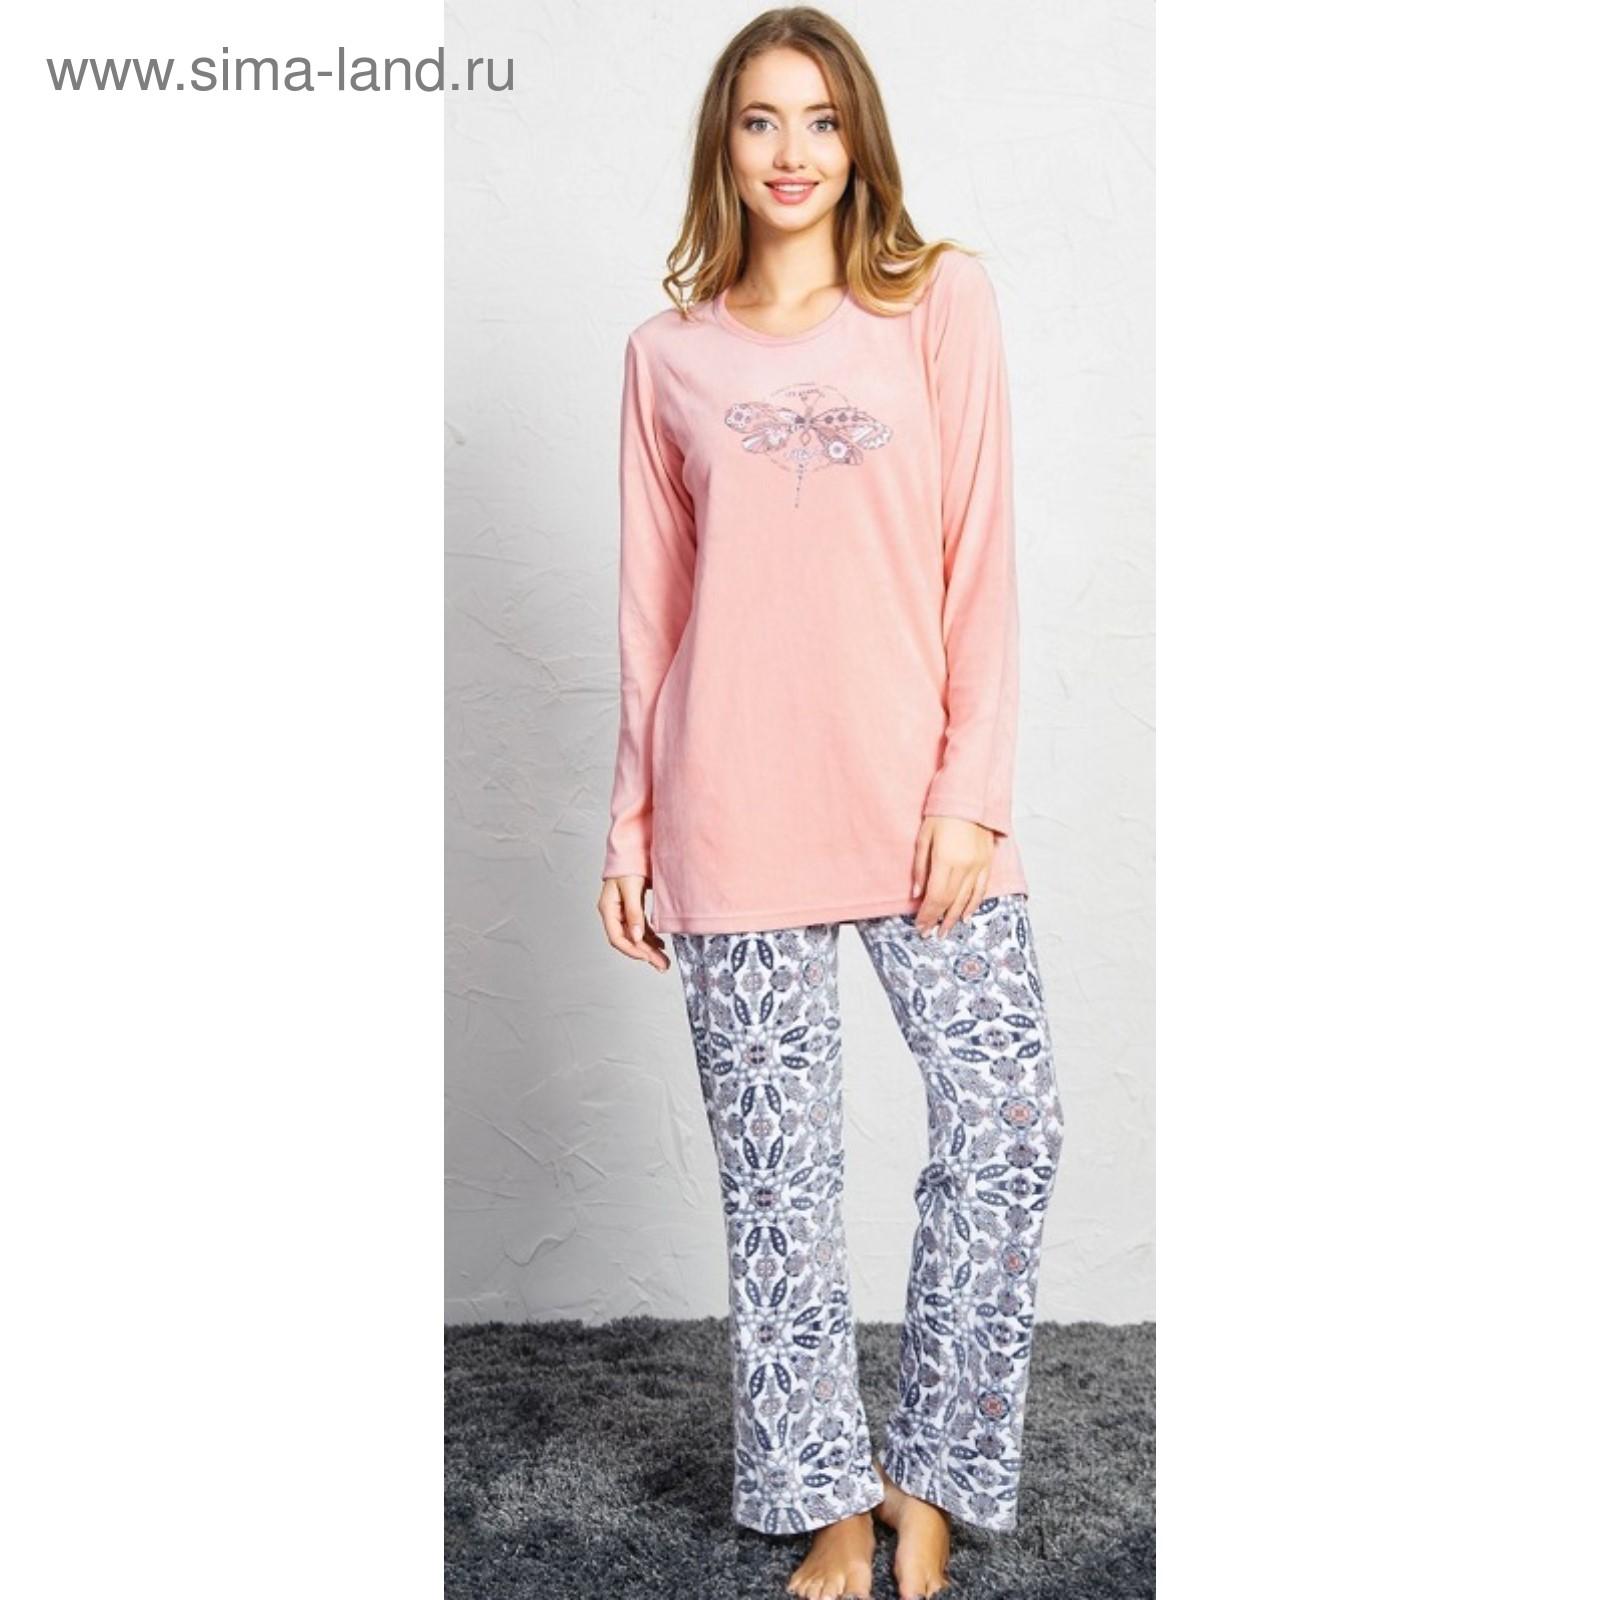 935ae37097decf9 Пижама женская «Стрекоза», размер XL, цвет розовый (4137733 ...